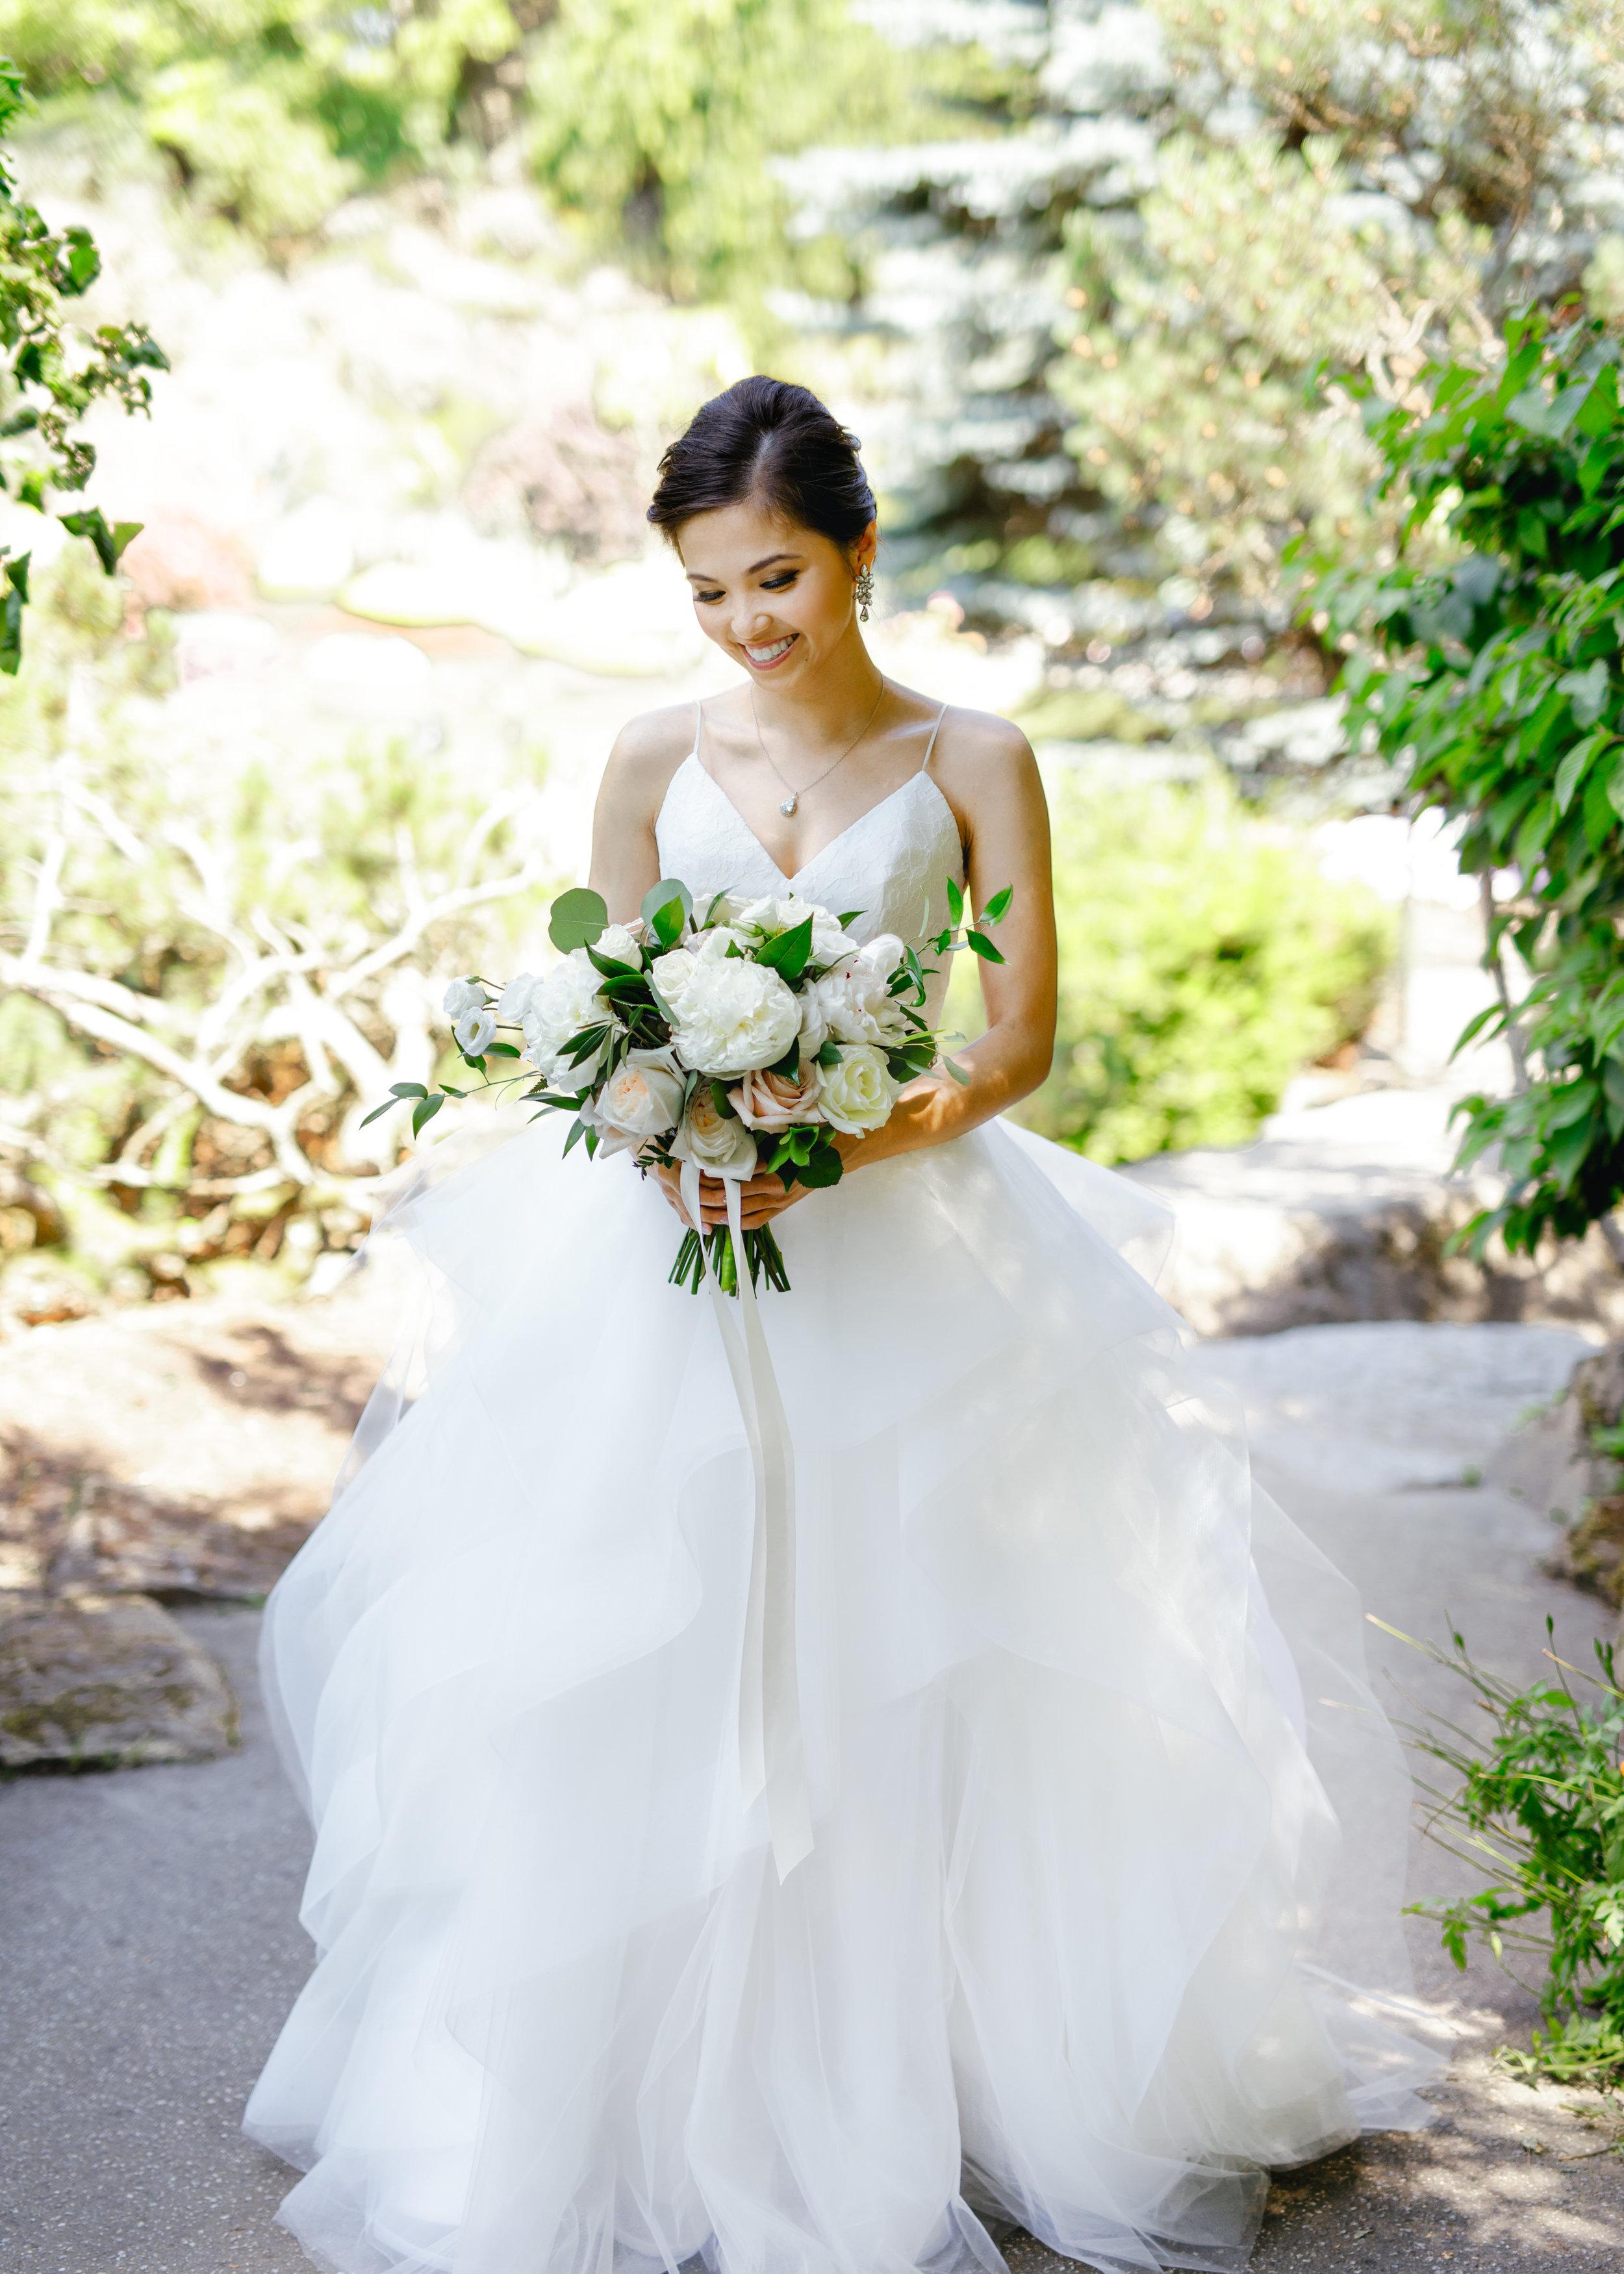 herastudios_wedding_nancy_james_hera_selects-52.jpg